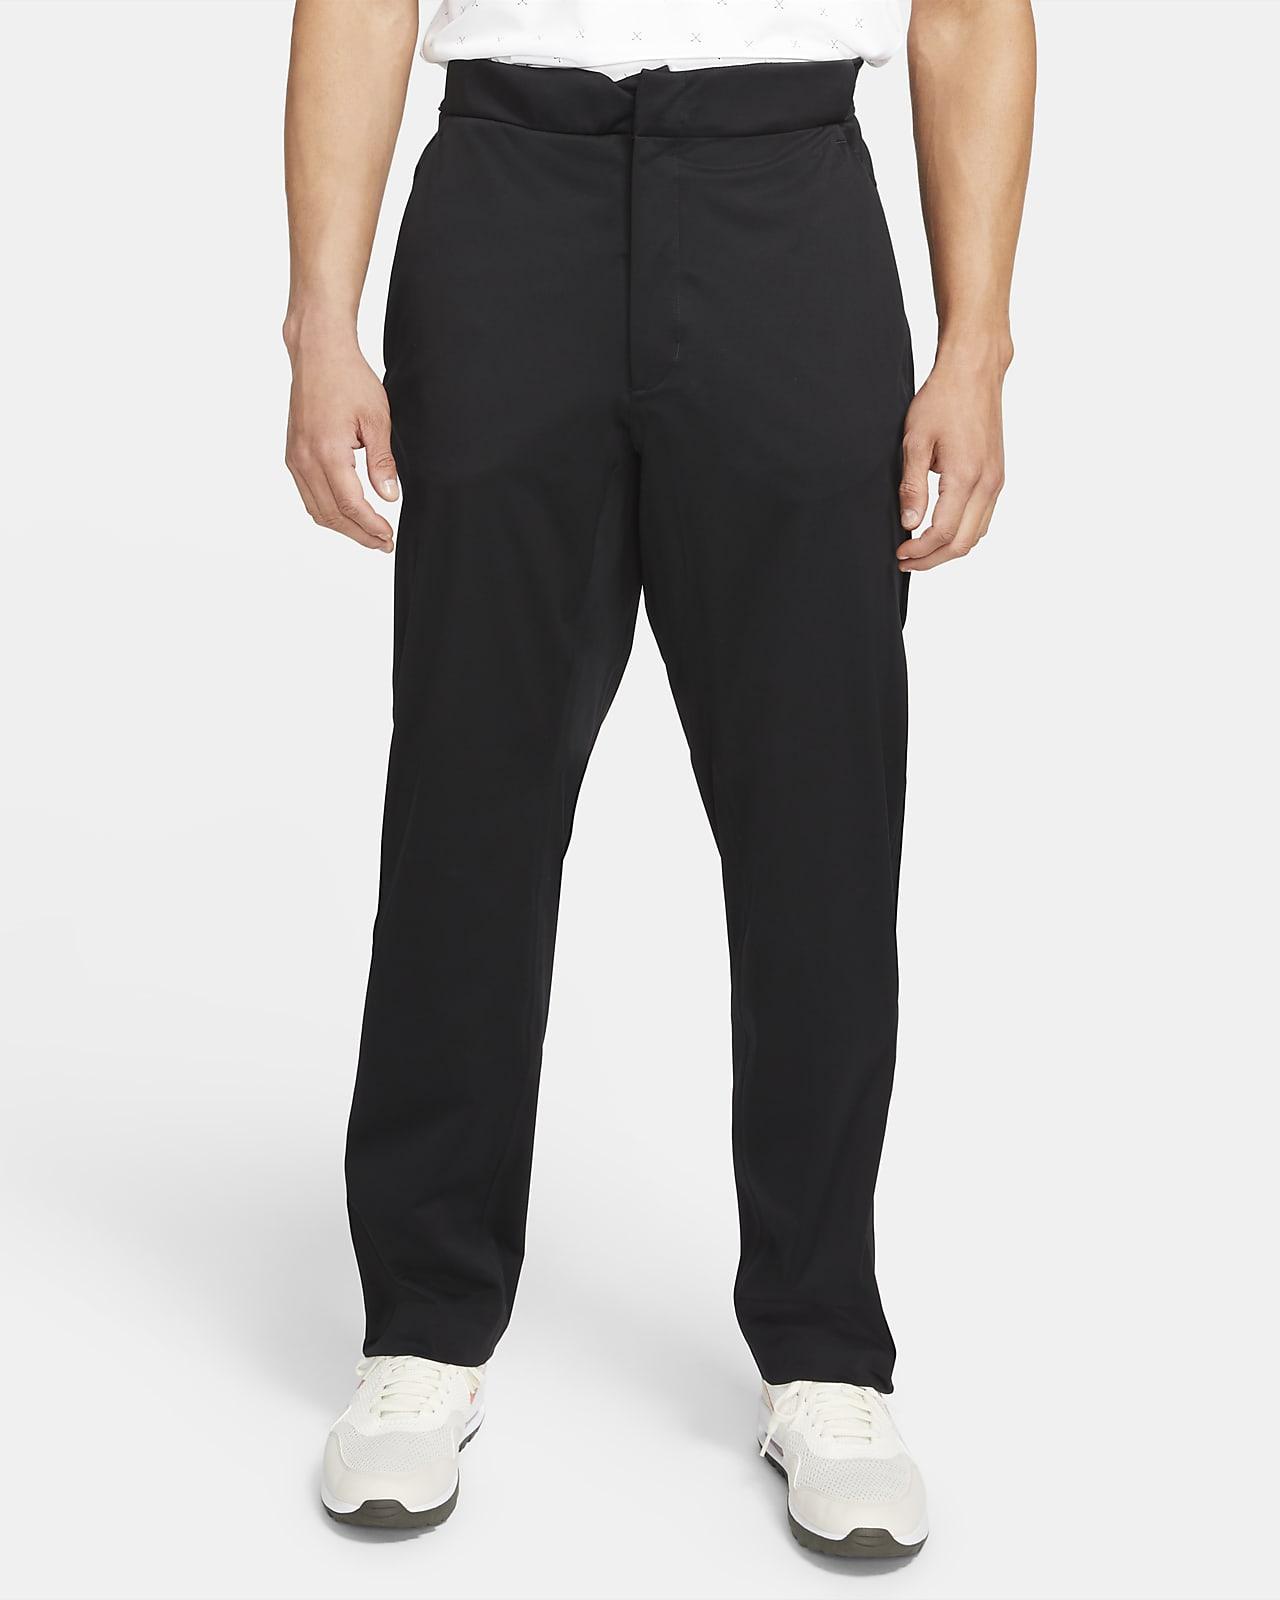 Nike Storm-FIT ADV Men's Golf Trousers